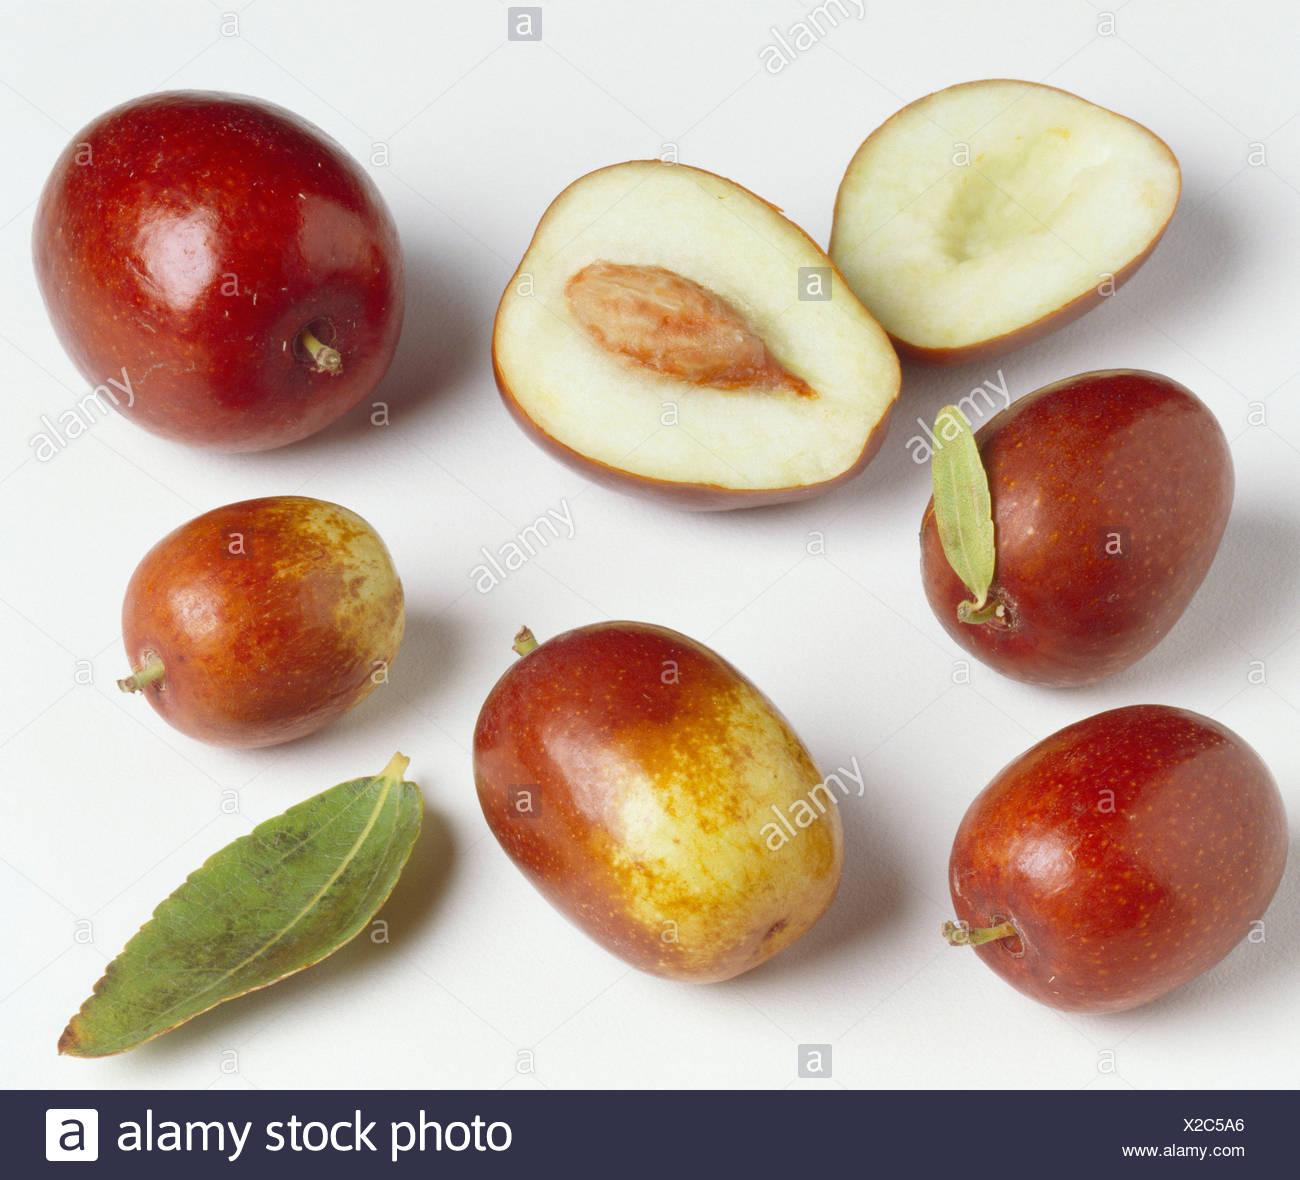 jujube fruit stock photo 276862830 alamy